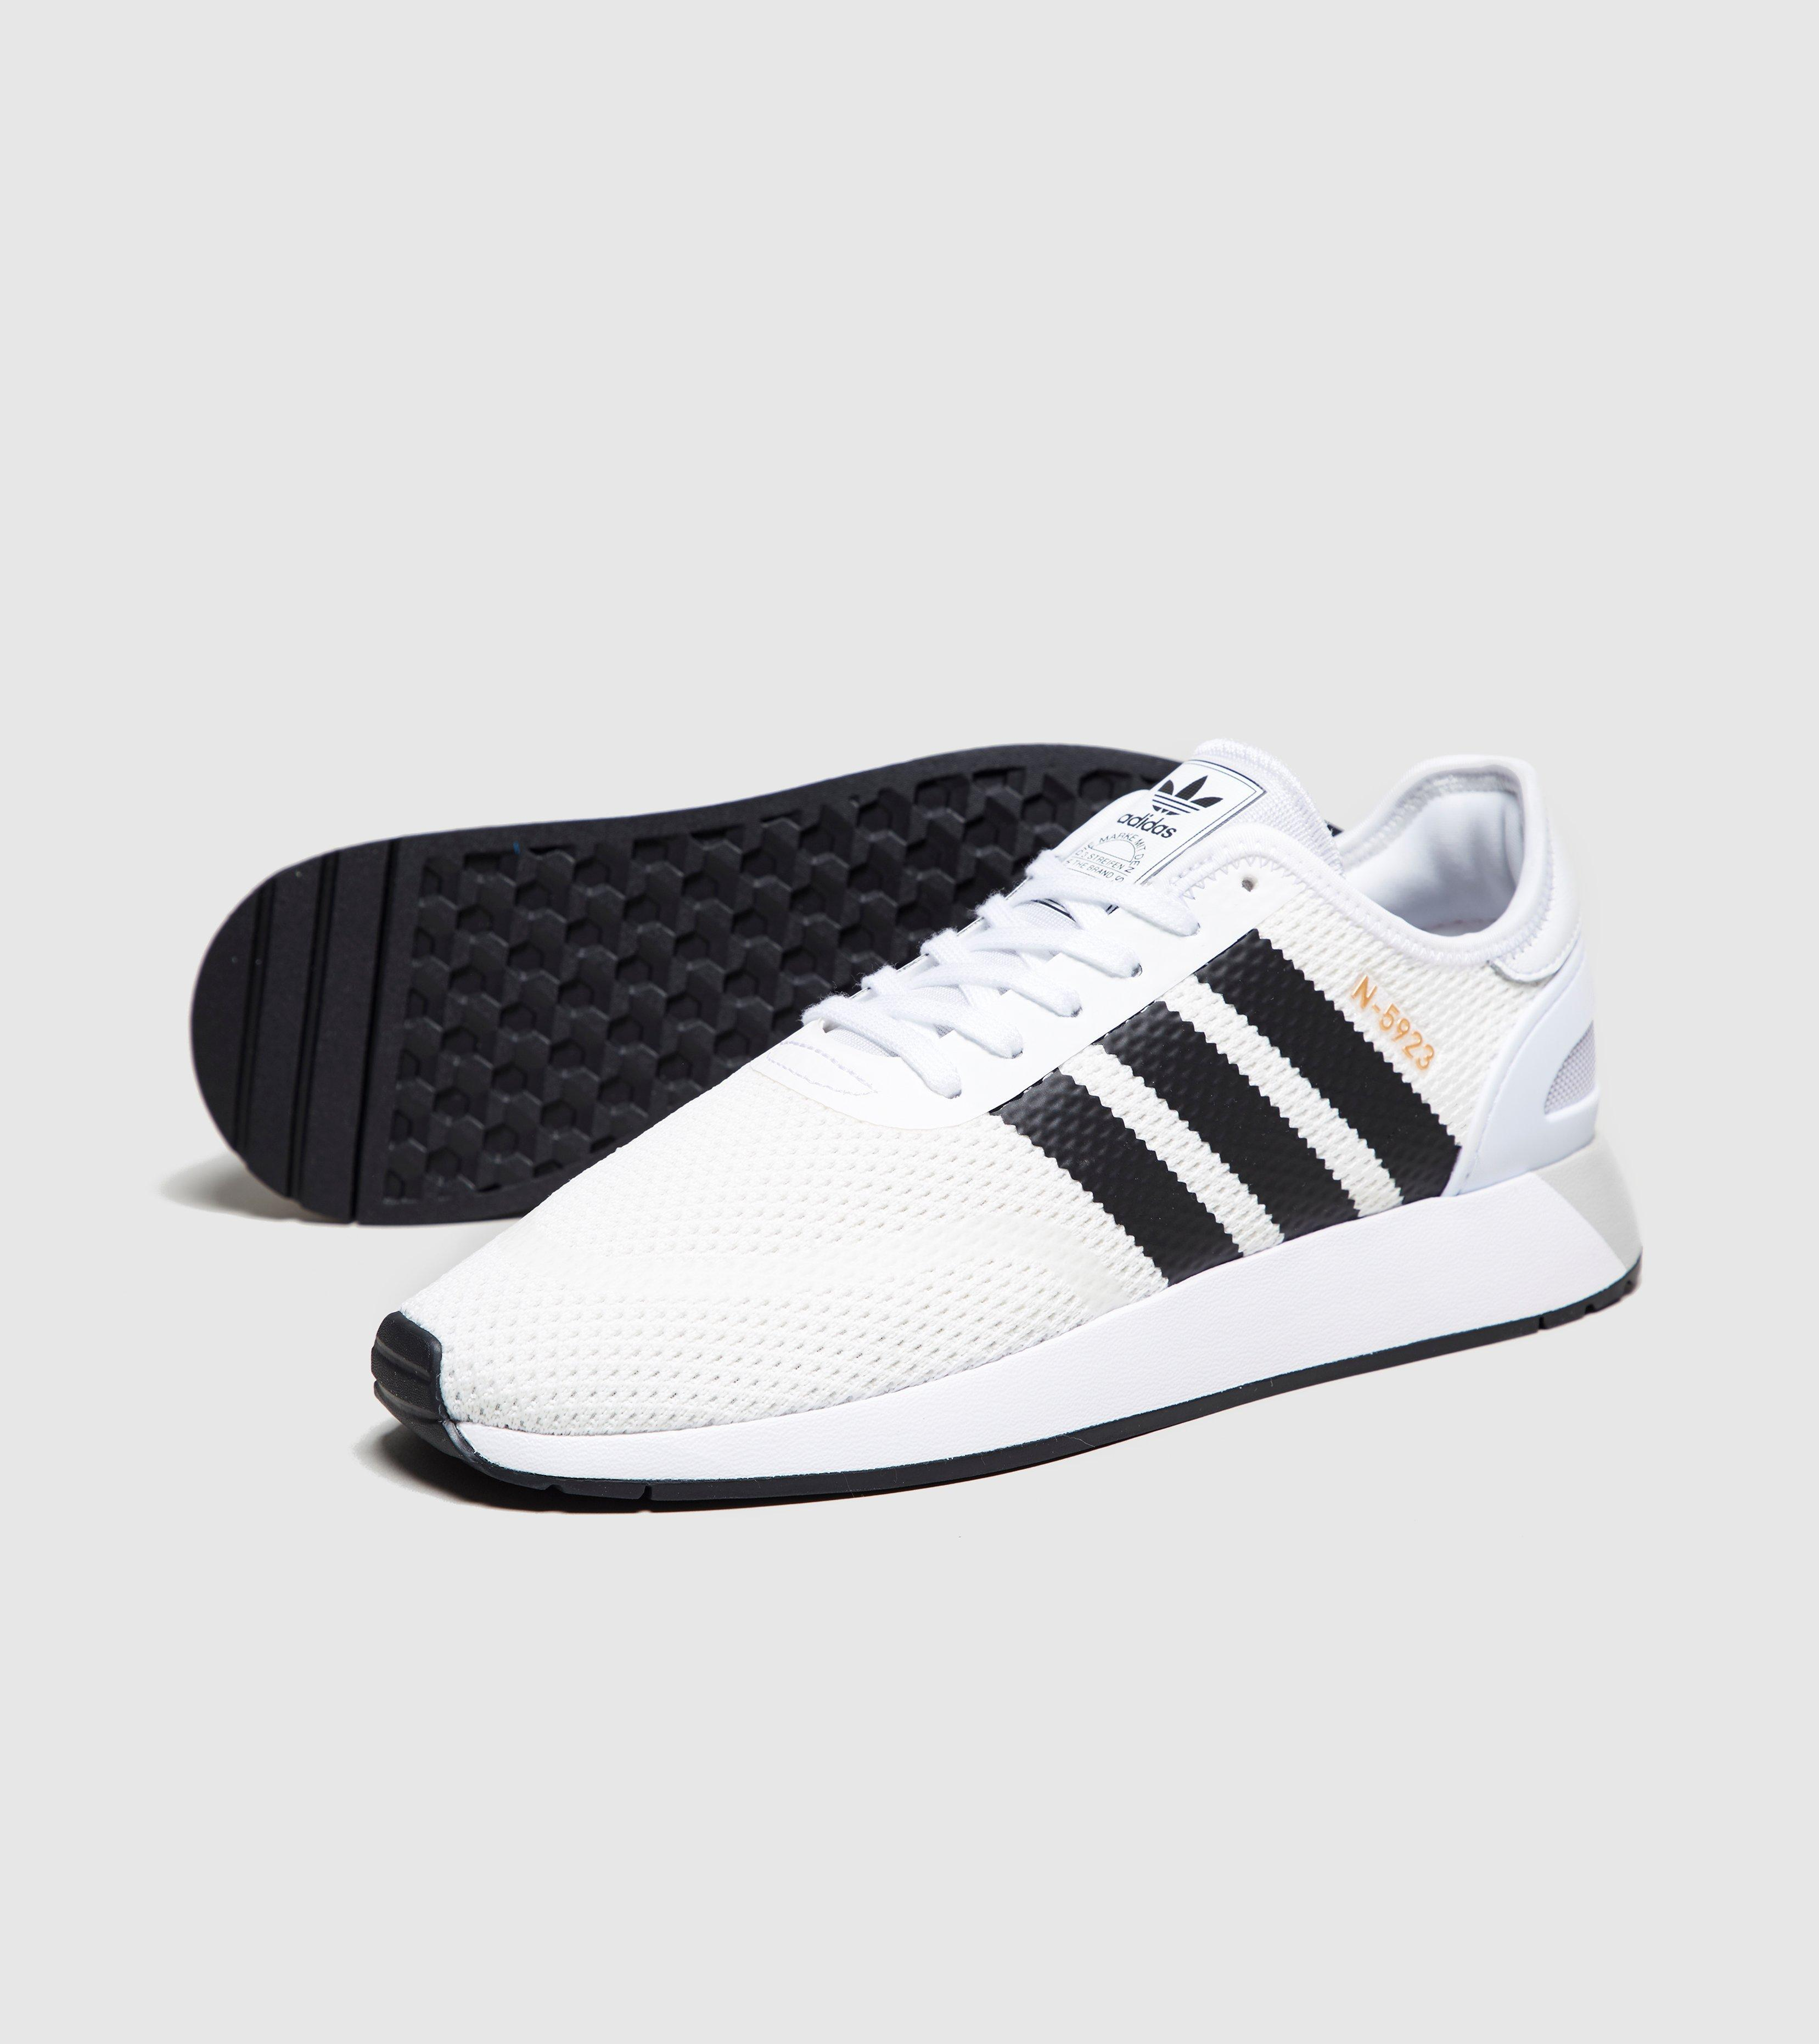 e5ce53efd8a Lyst - adidas Originals N-5923 in White for Men